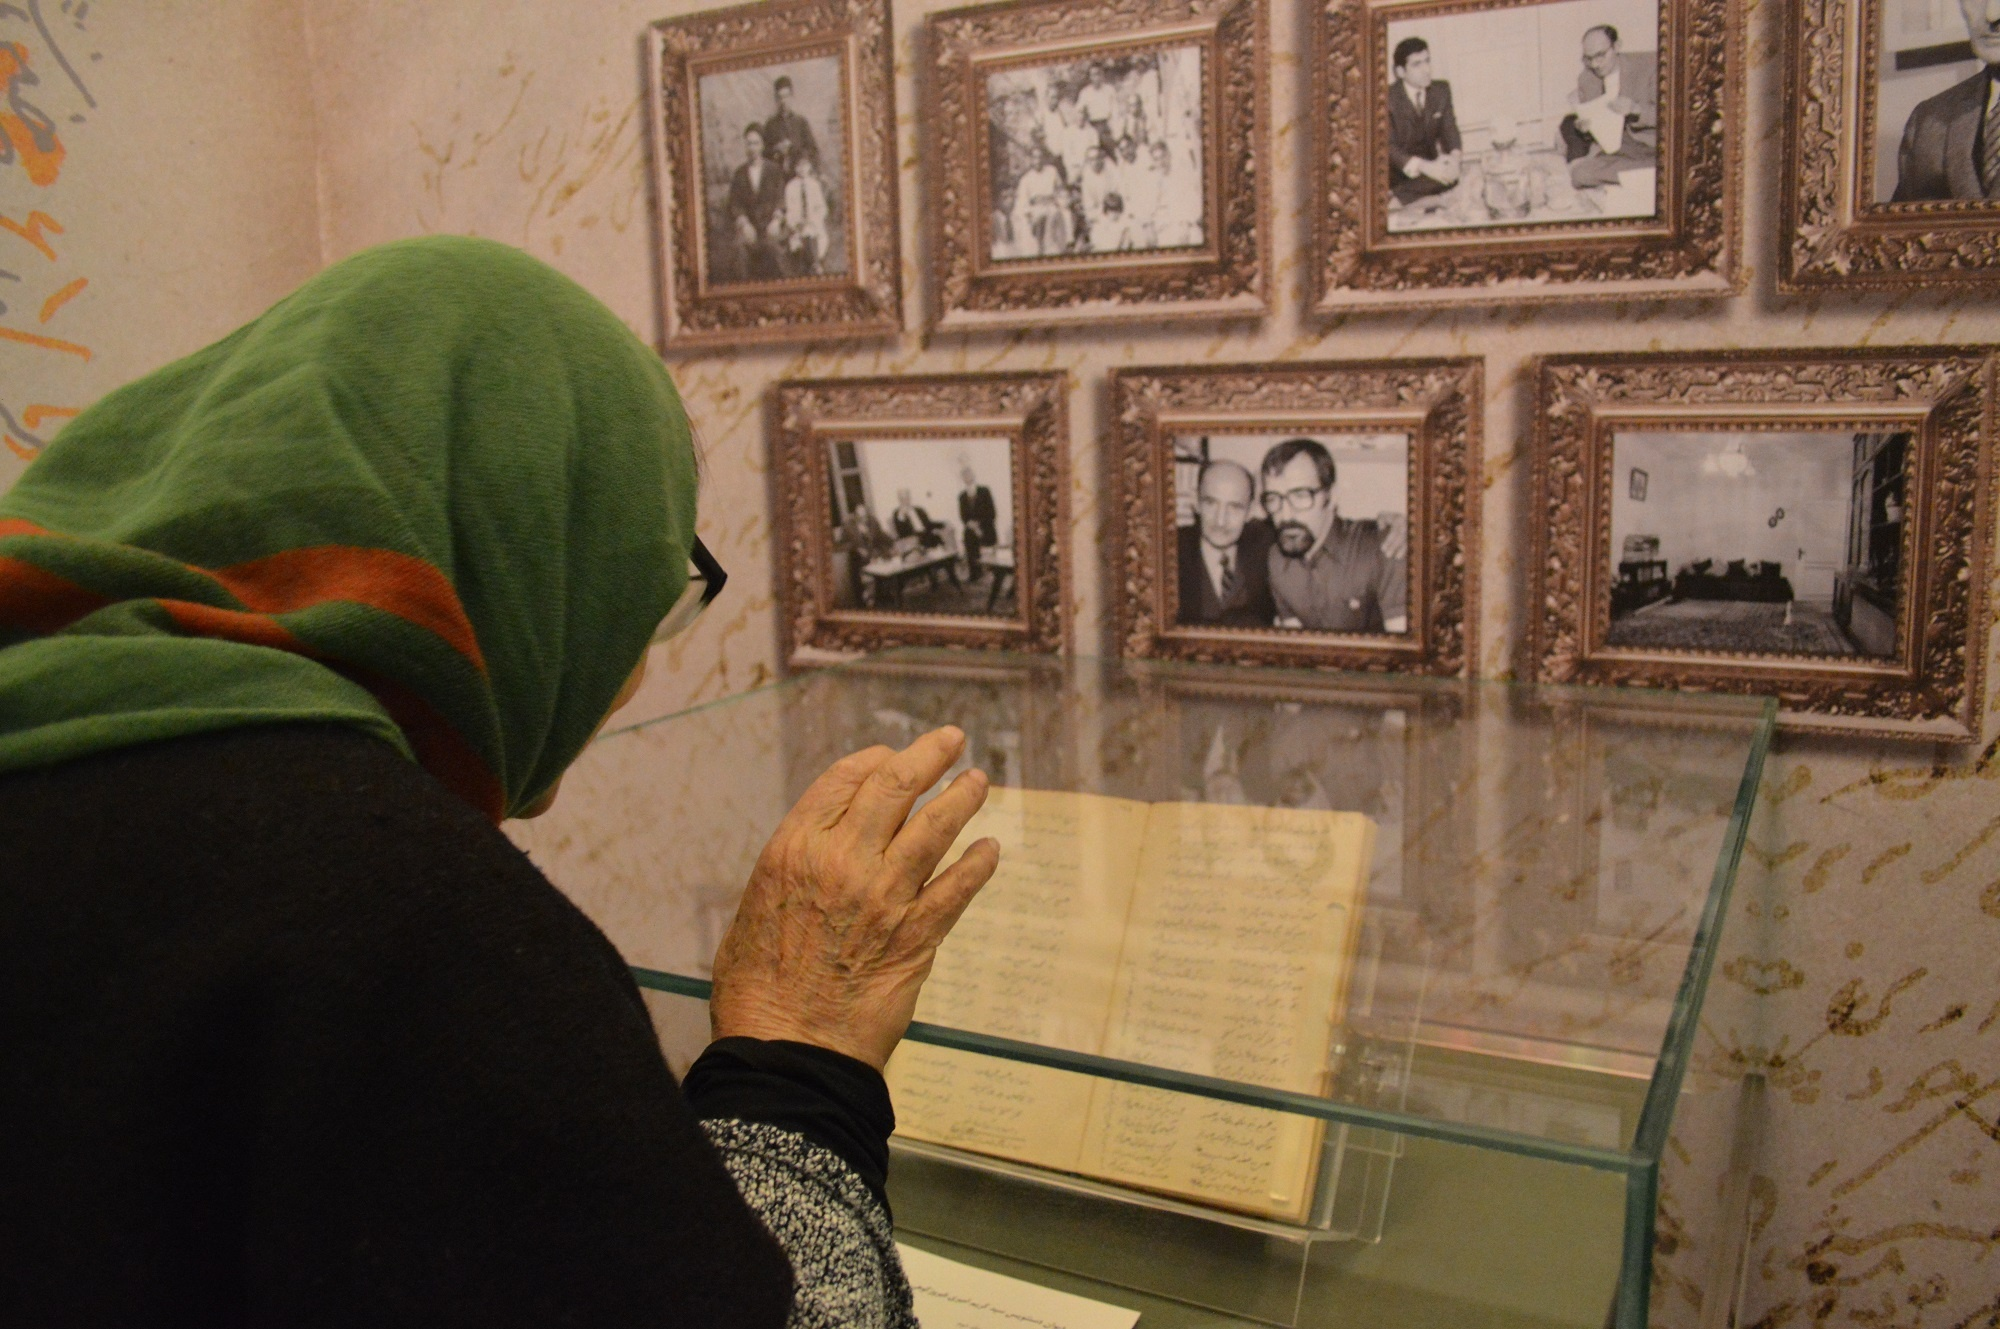 تک اثر دیوان سید کریم امیری فیروزکوهی3